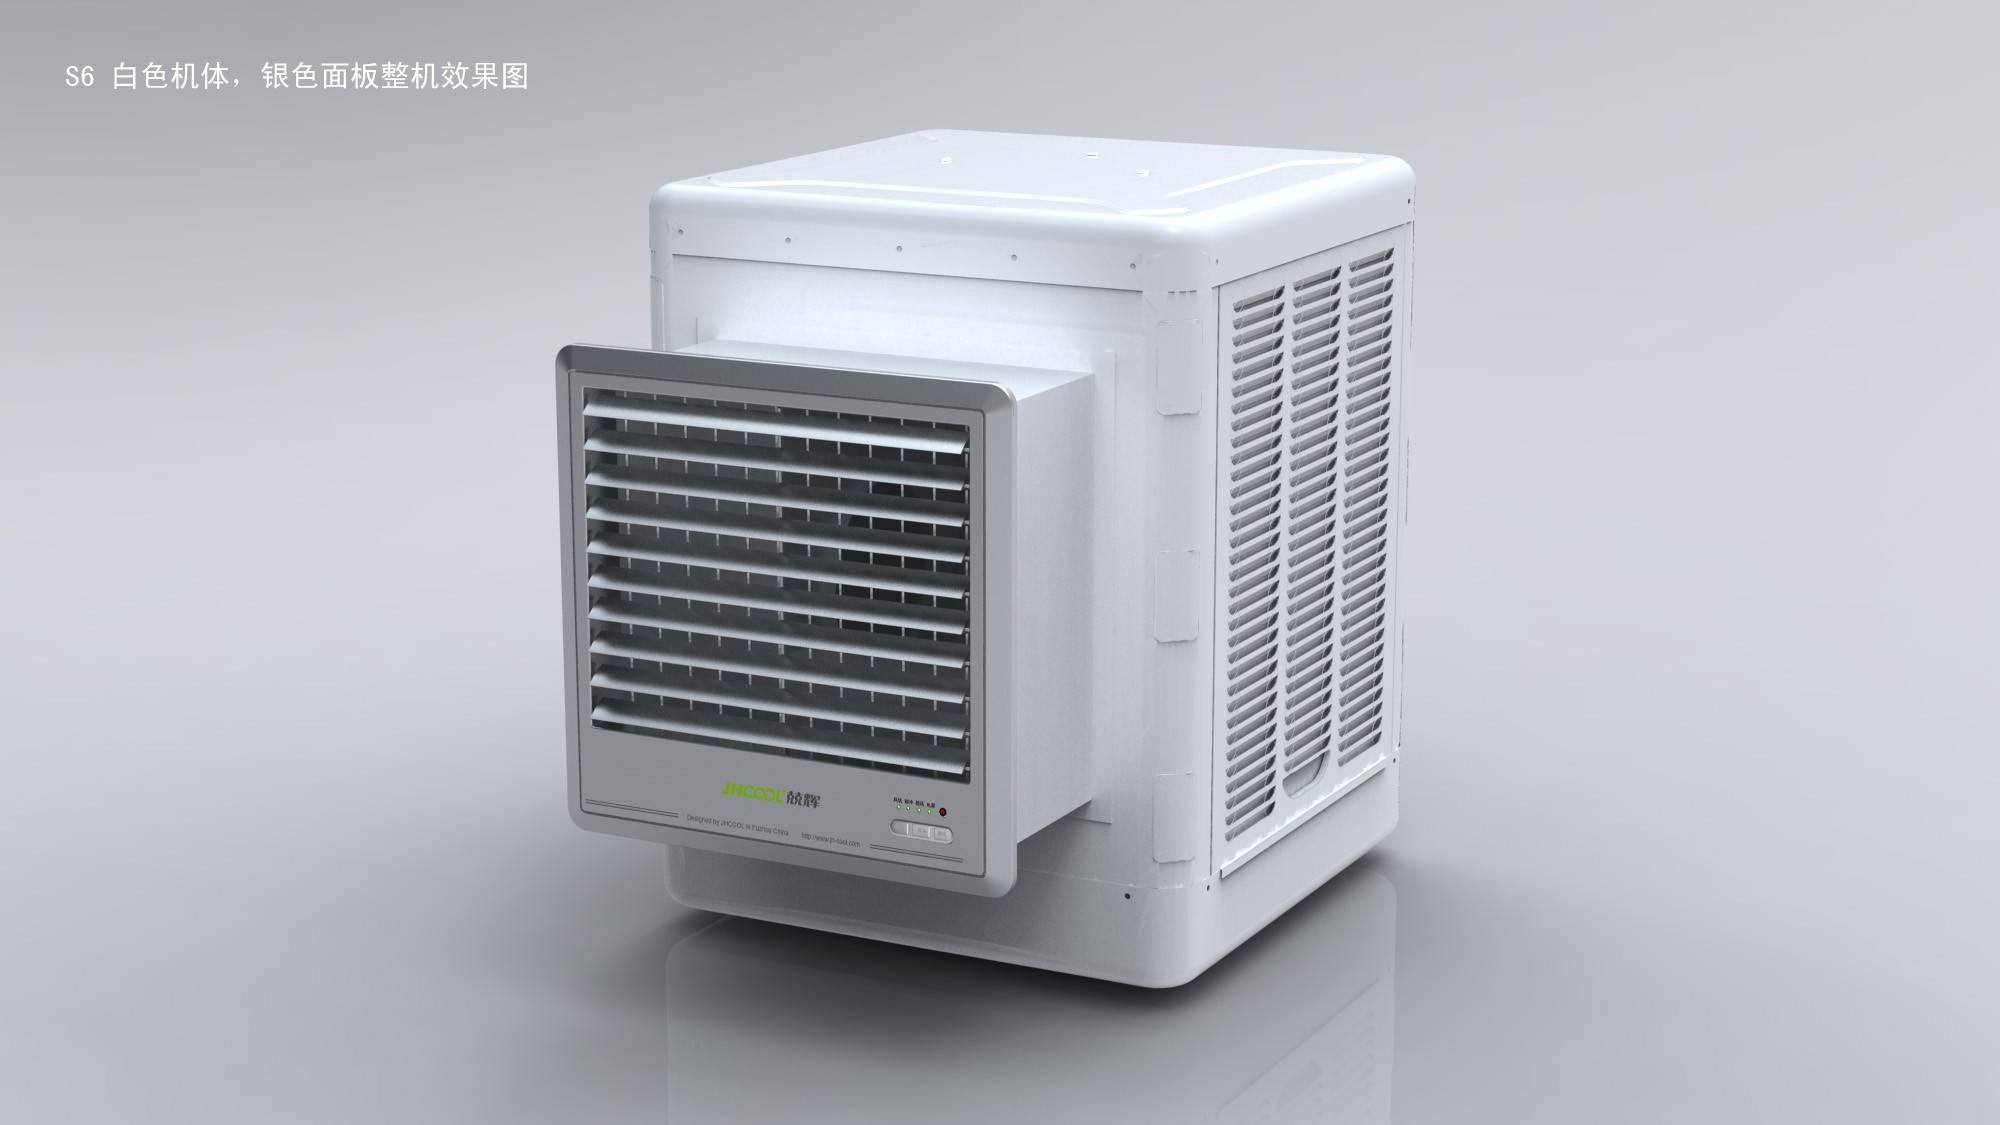 Korea Cooler Co Ltd